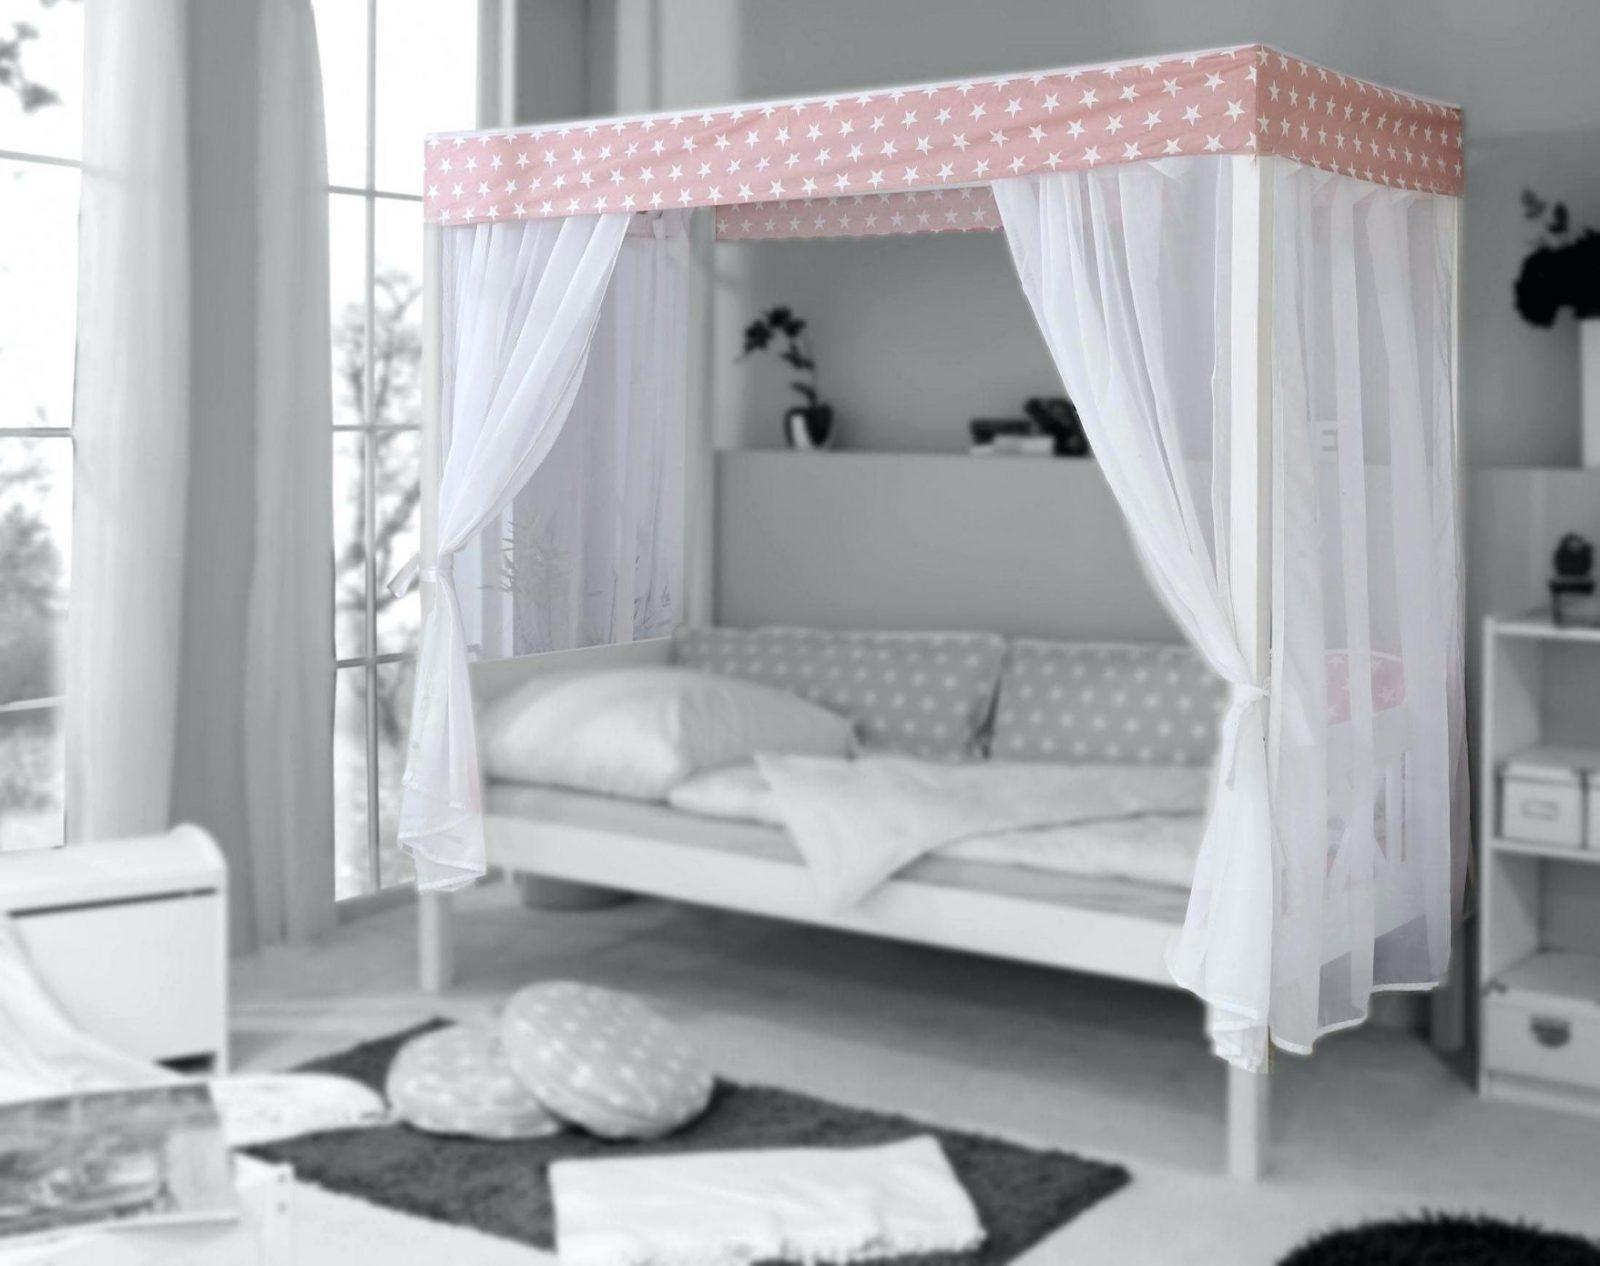 Himmel Bett Beach Resort Spa Himmelbett Ikea von Himmelbett Vorhang Selber Machen Photo